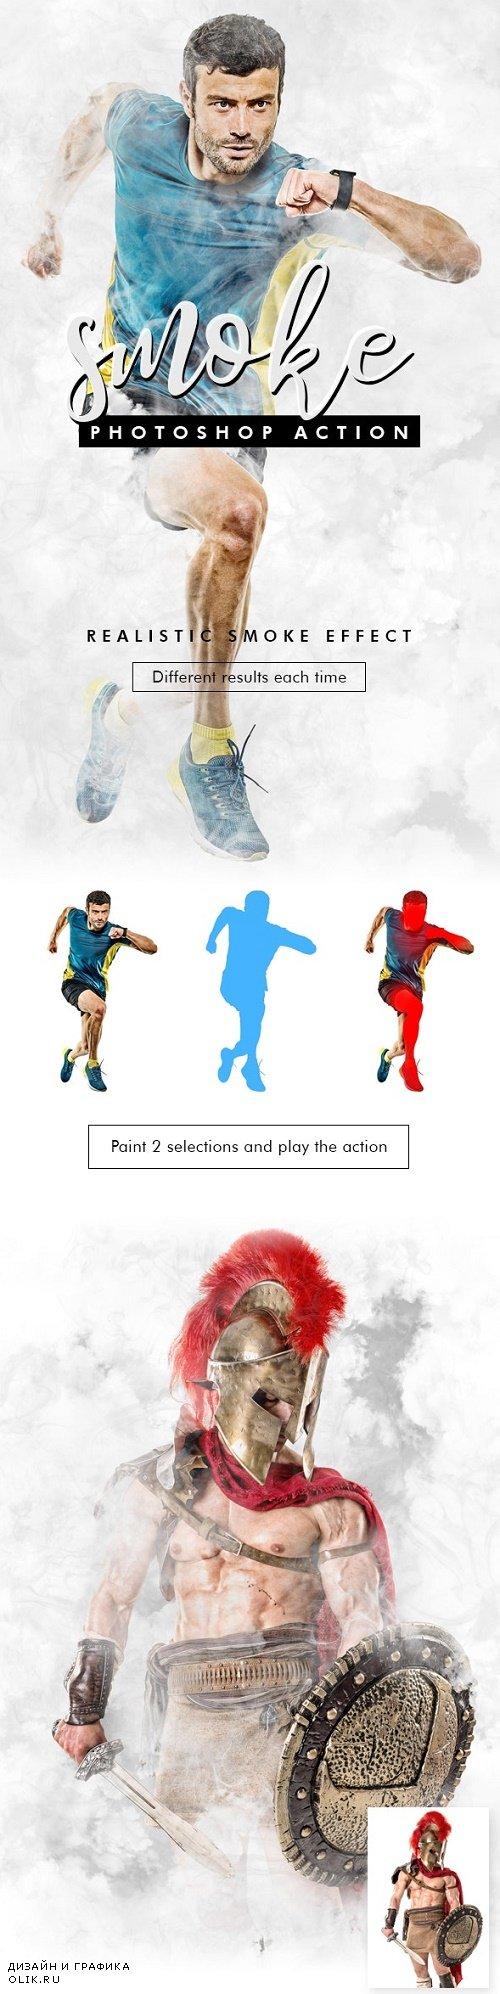 Smoke Photoshop Action 24630509